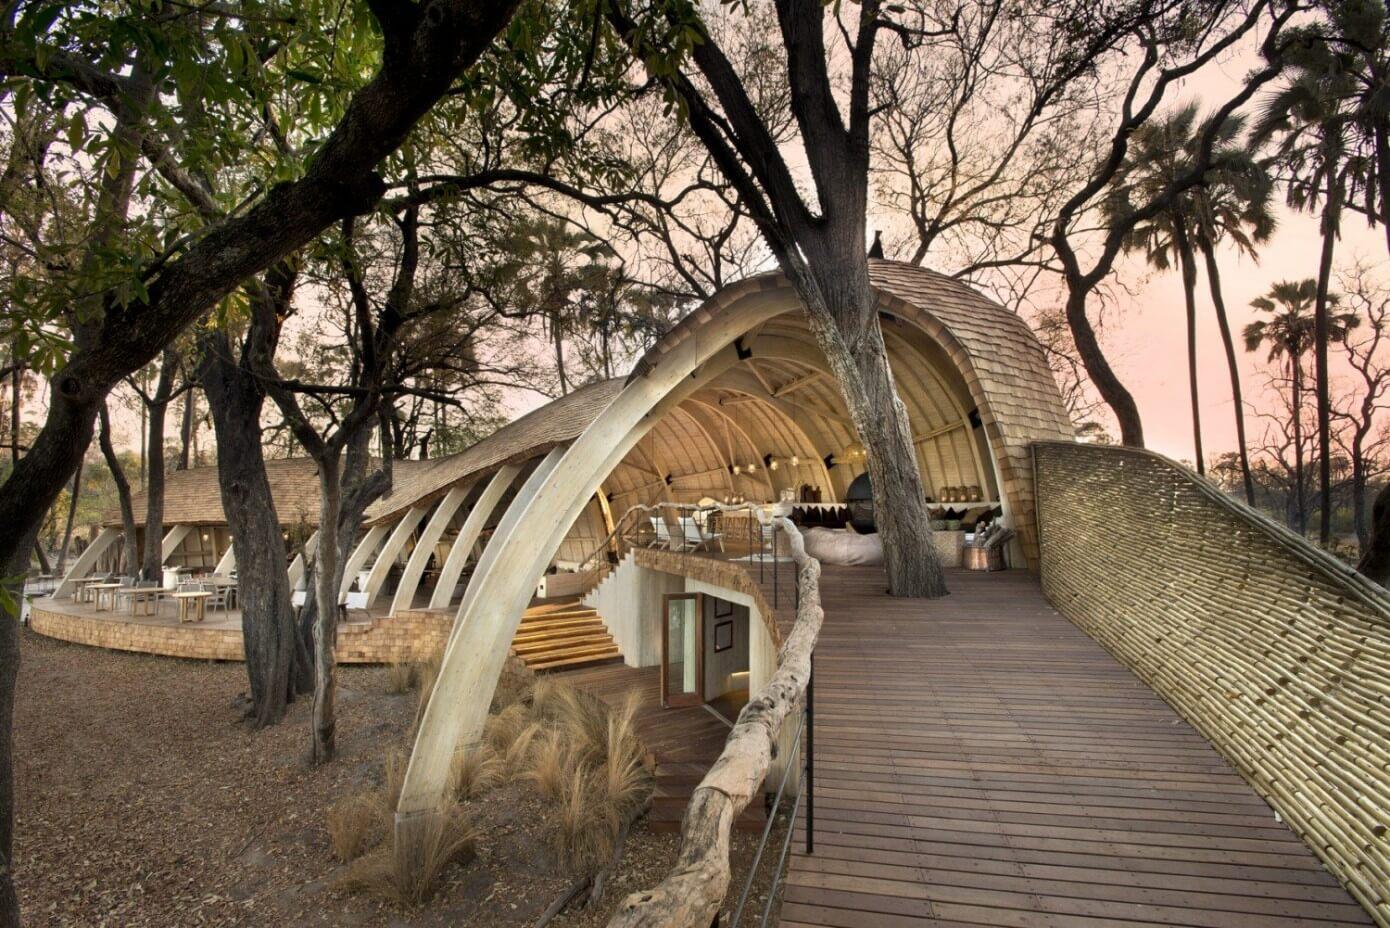 Sandibe Safari Lodge by Michaelis Boyd